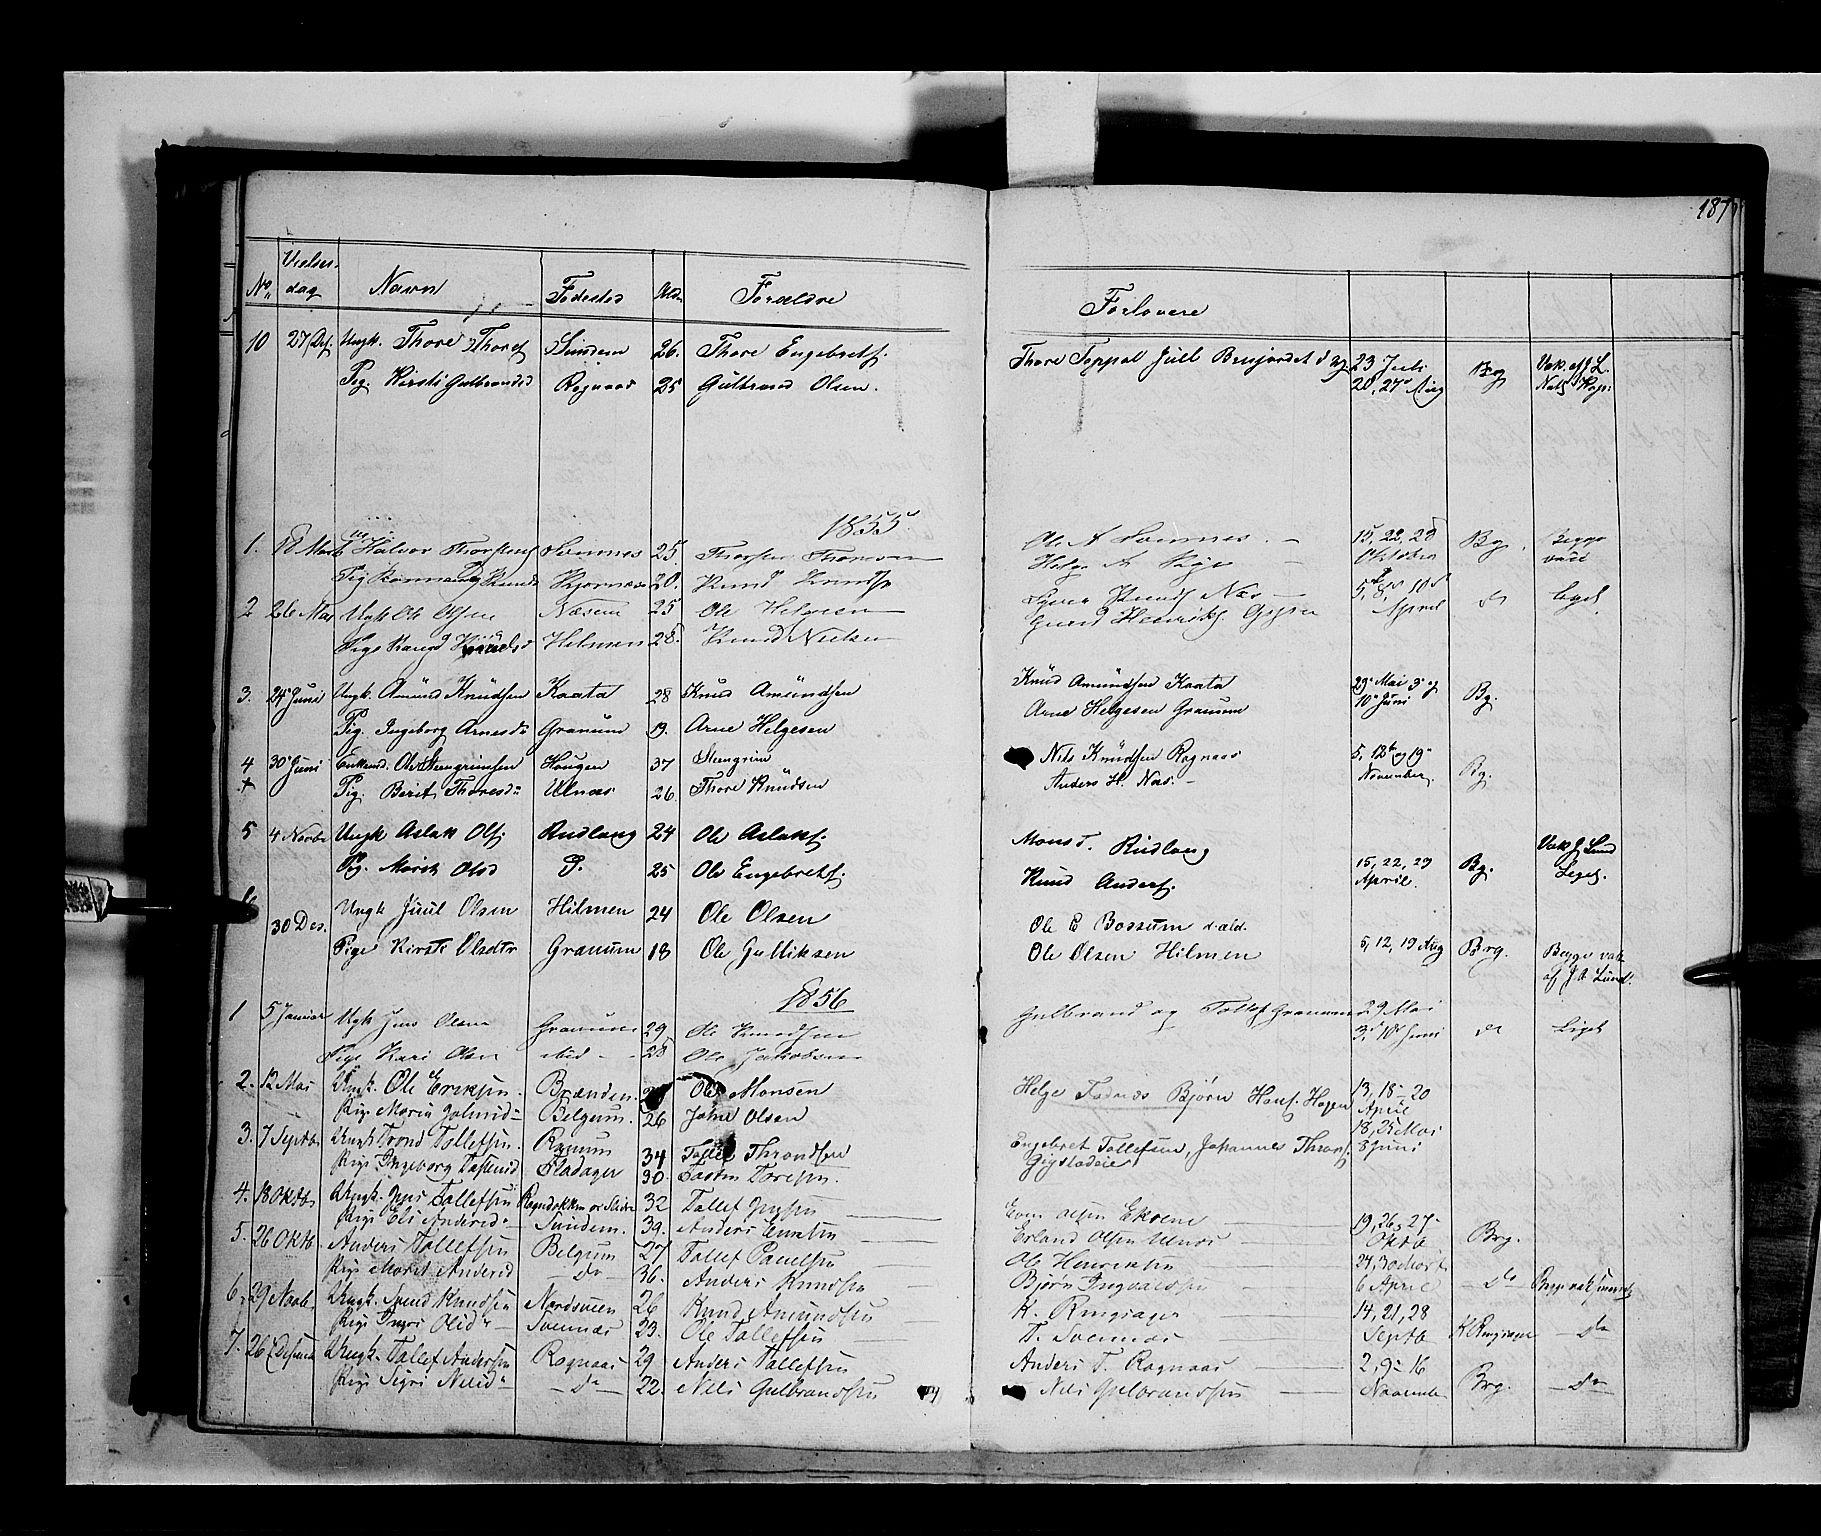 SAH, Nord-Aurdal prestekontor, Ministerialbok nr. 6, 1842-1863, s. 187